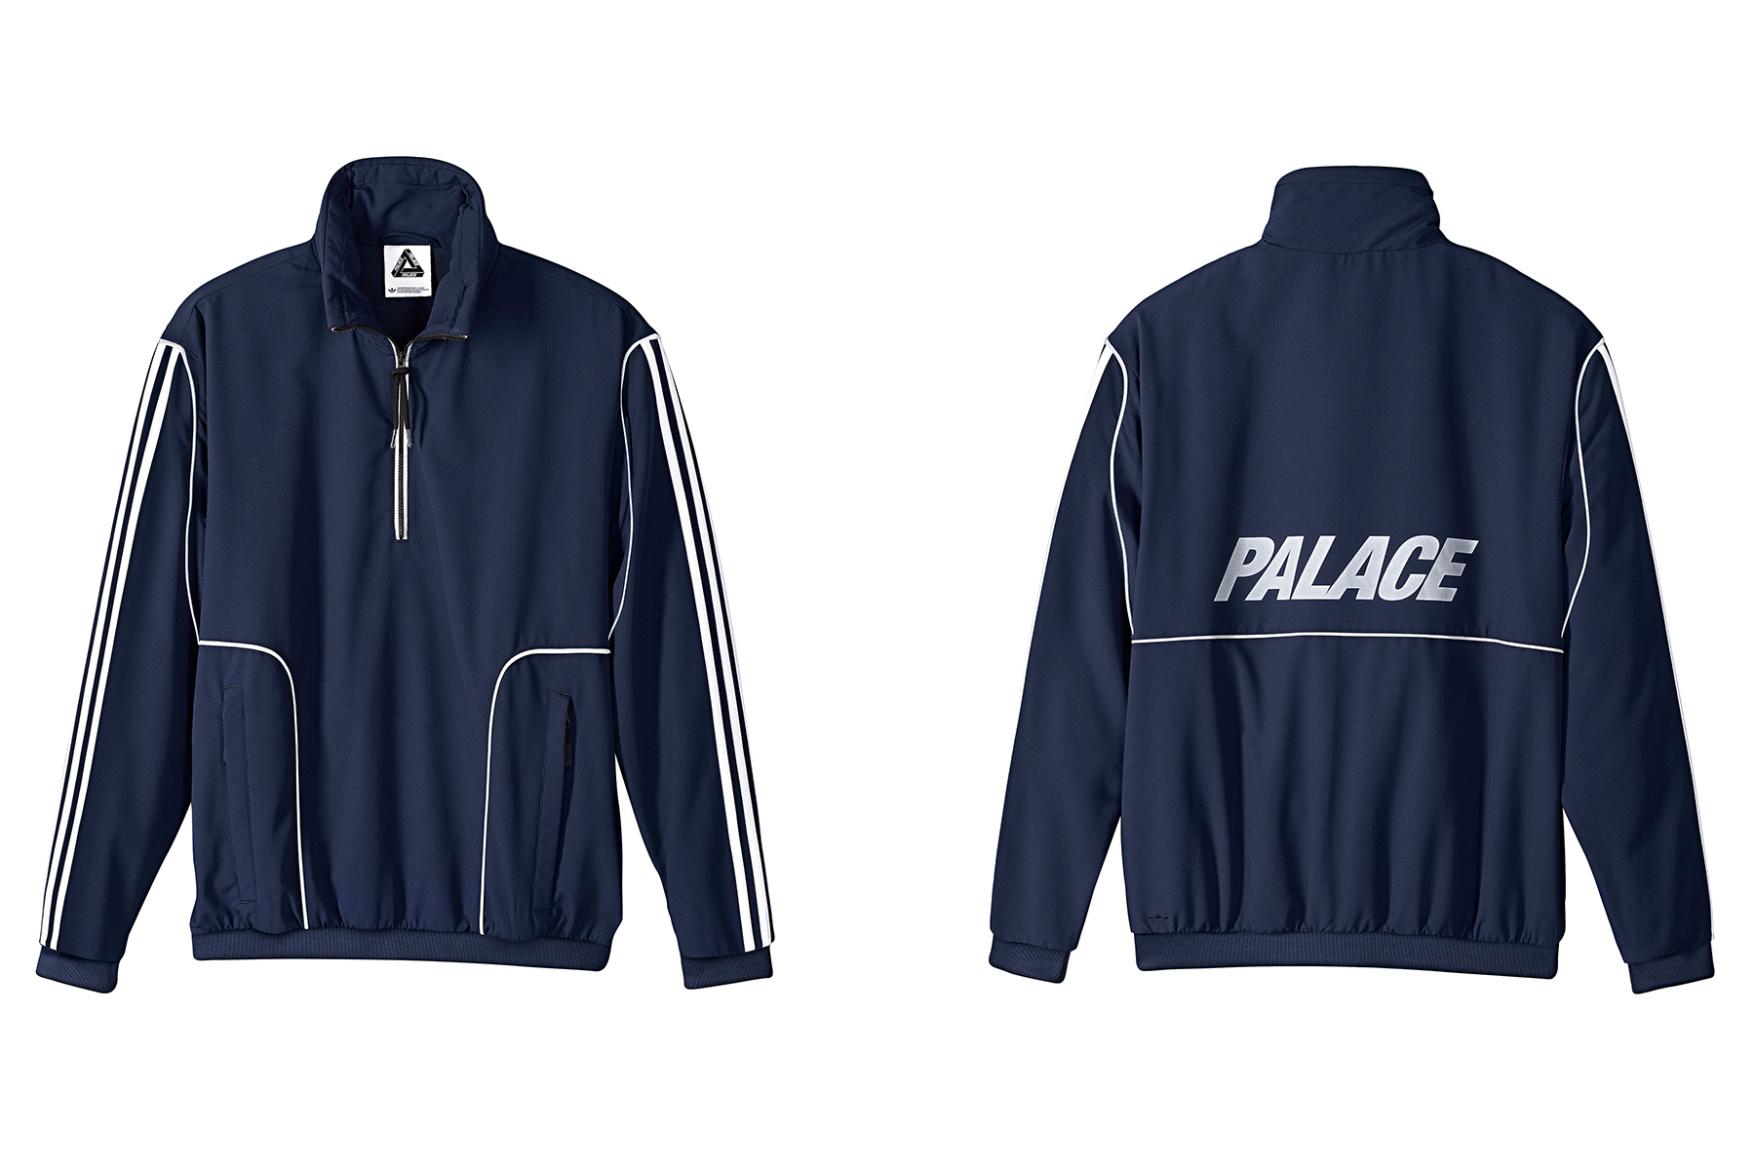 palace-adidas-originals-2016-spring-summer-collection-part-2-2